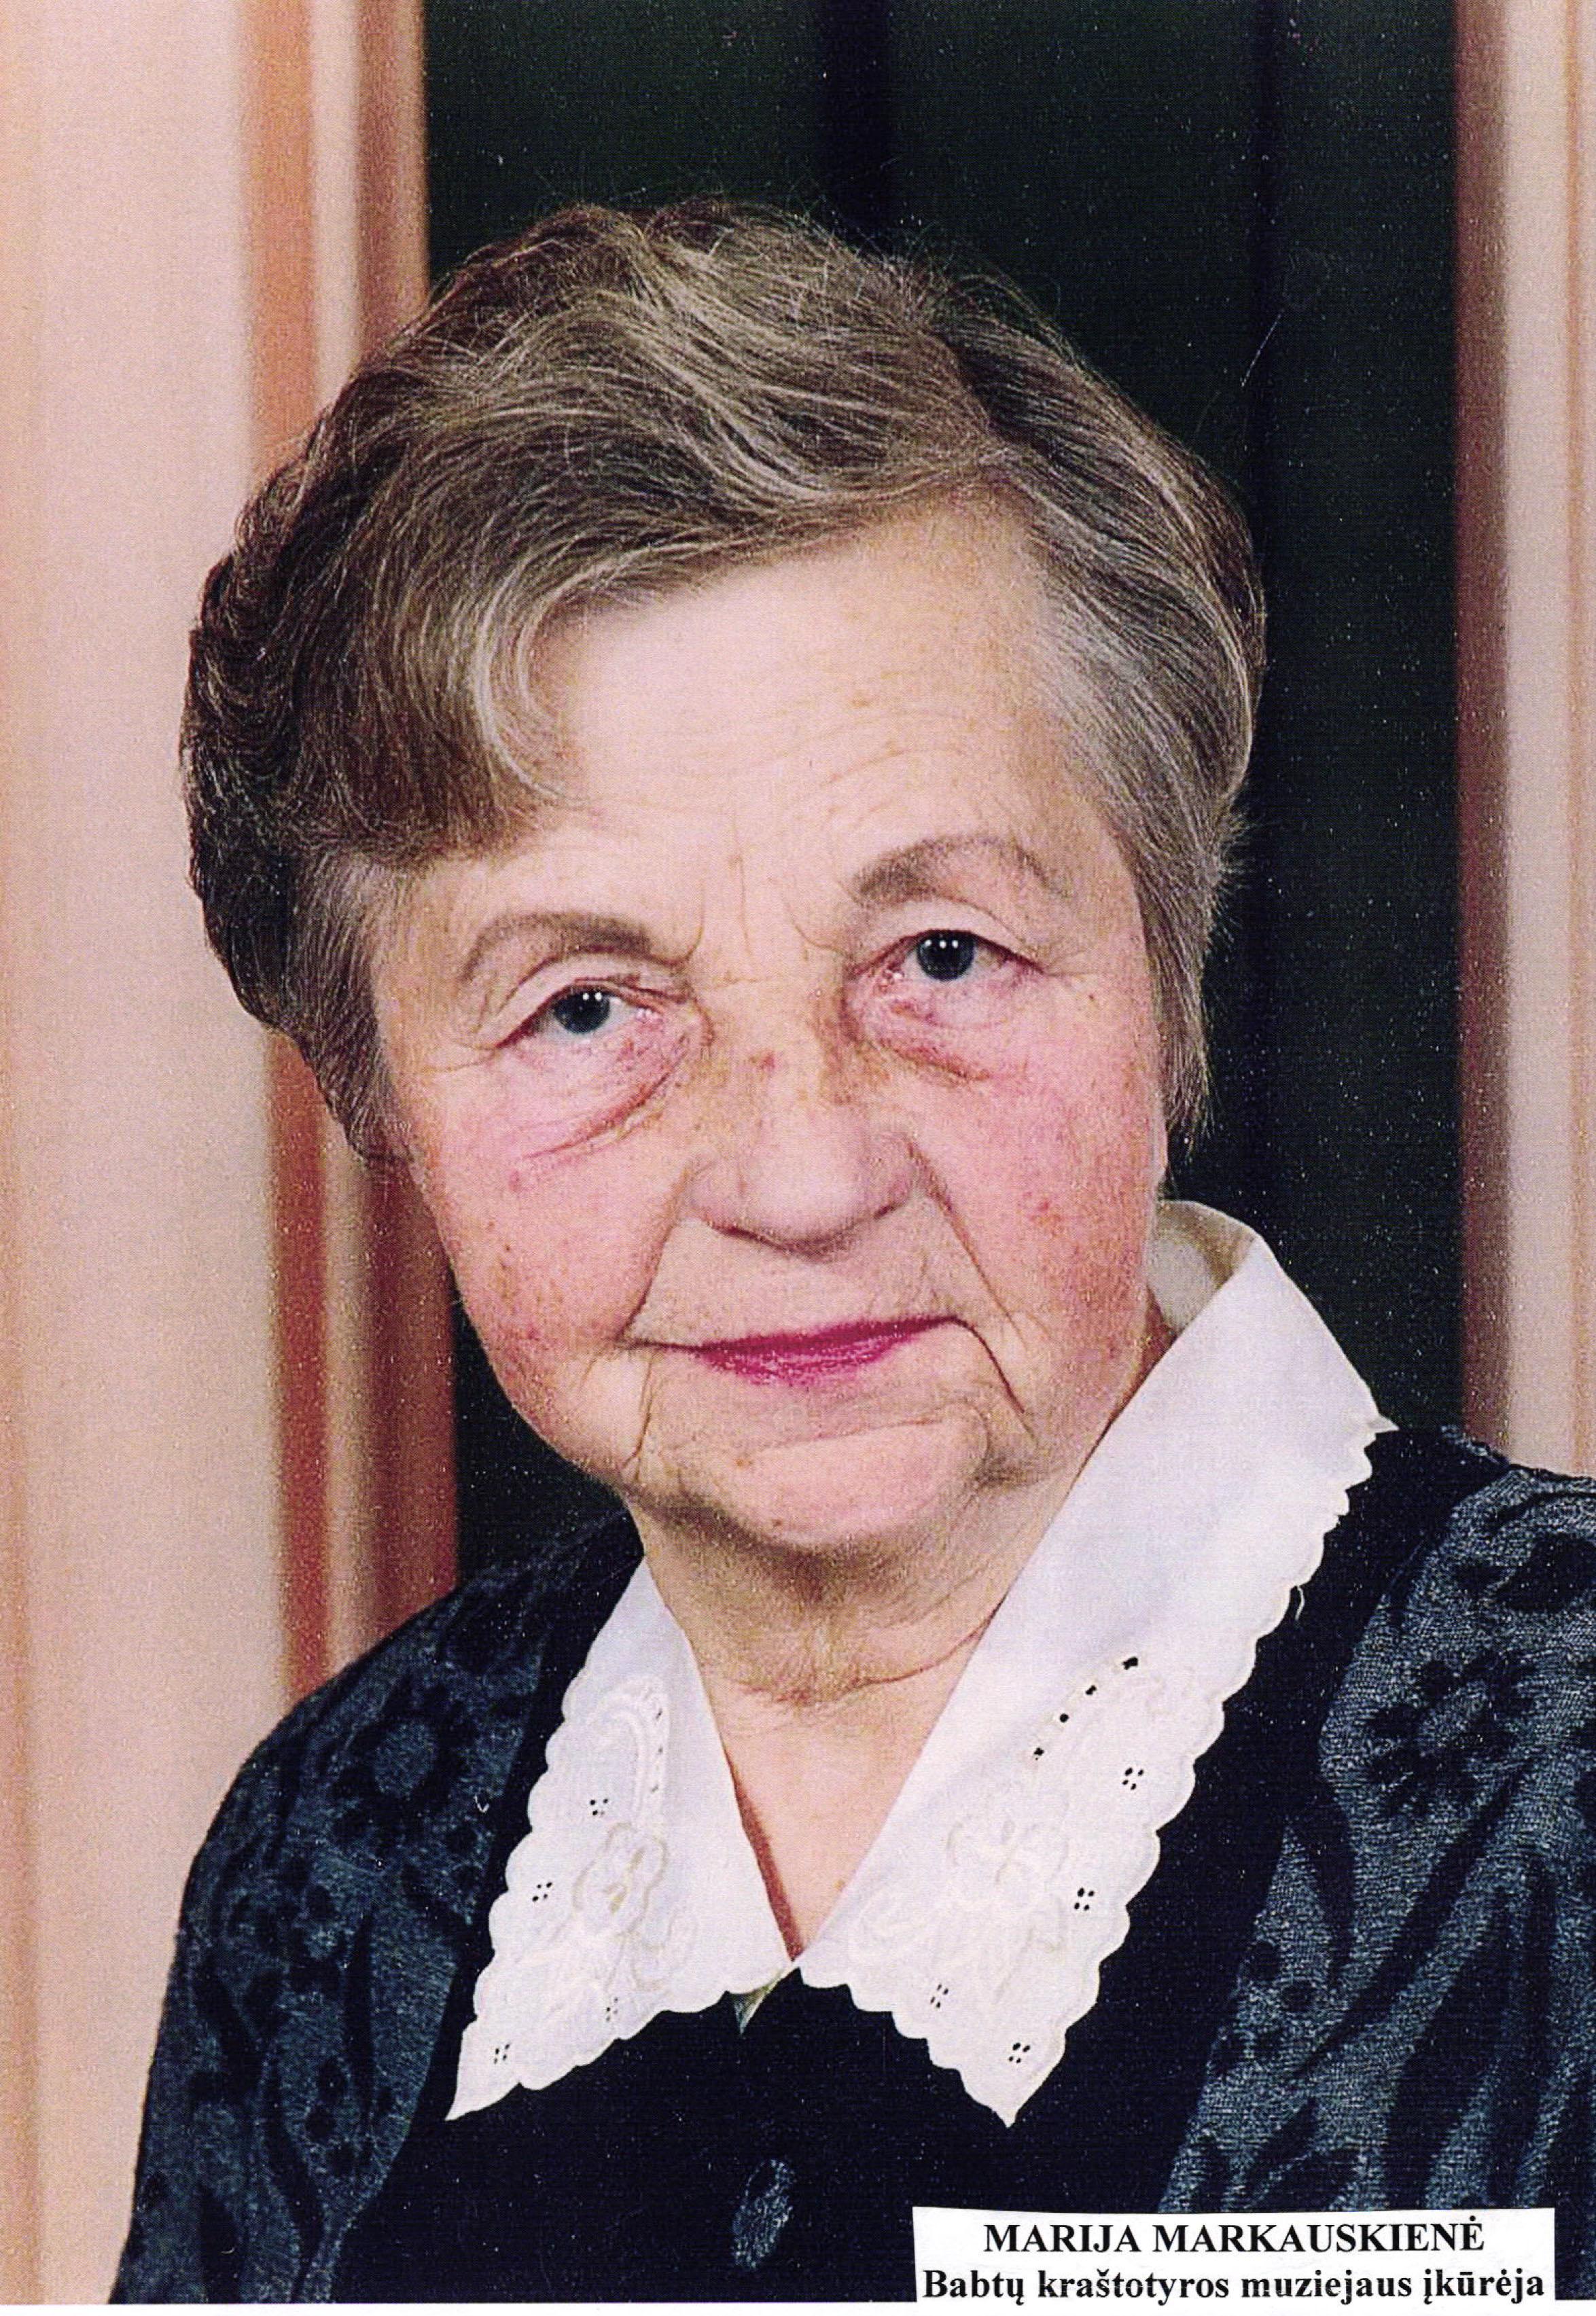 Marija Markauskienė